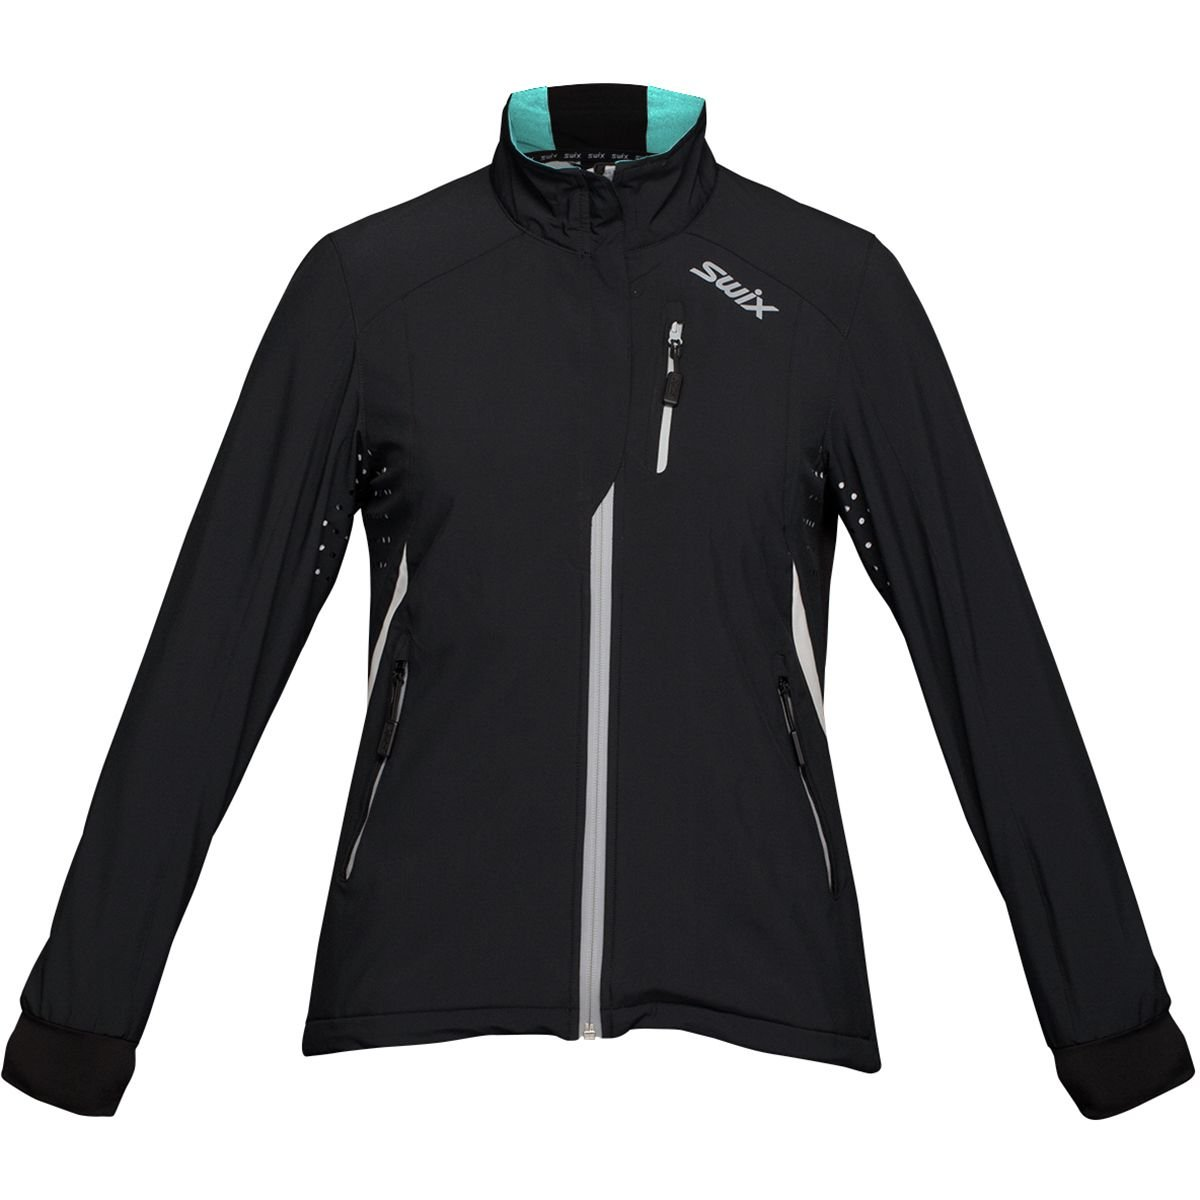 Swix Bekke Tech Jacket – Women 's B077LM82M1 X-Large|ブラック ブラック X-Large